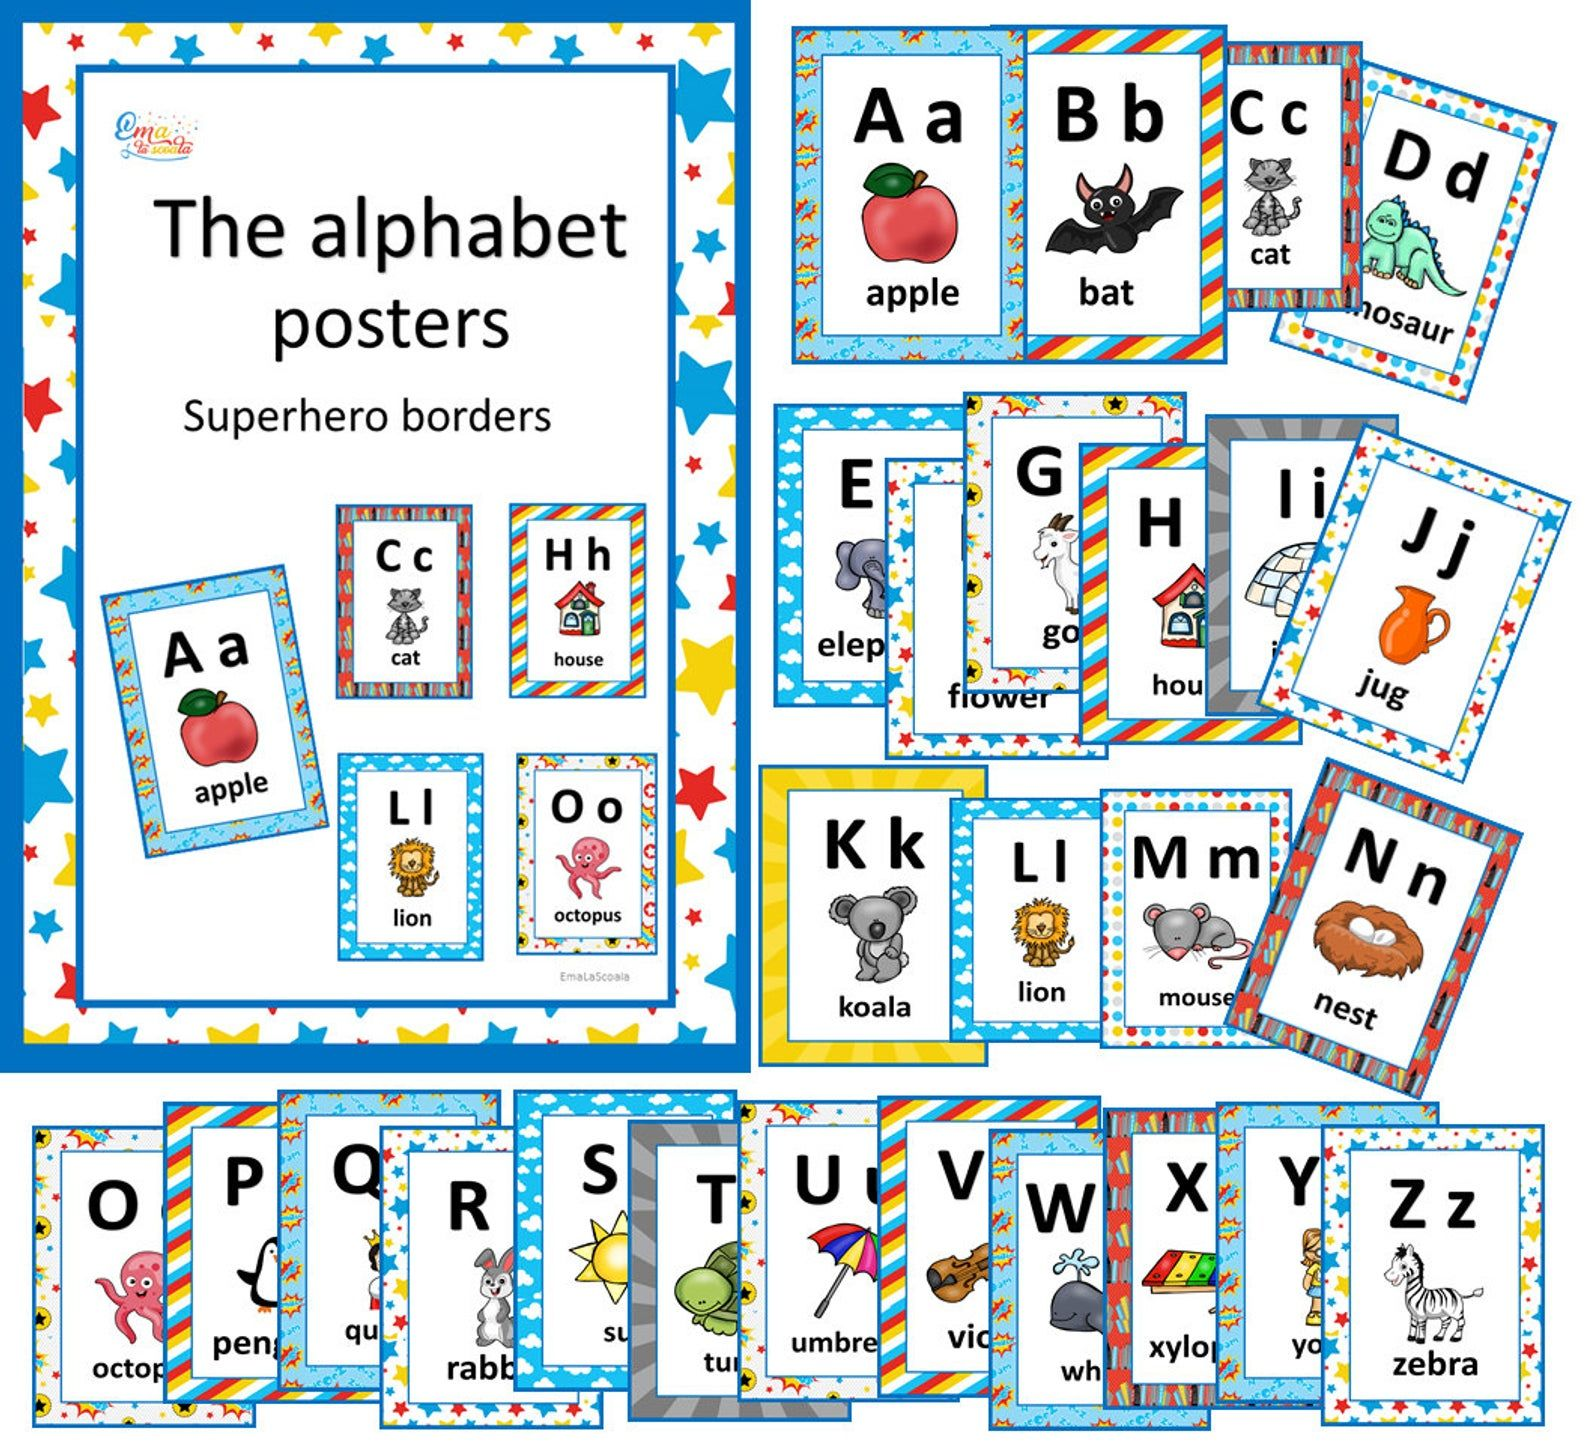 Supehero Alphabet Letters Printable Alphabet Posters